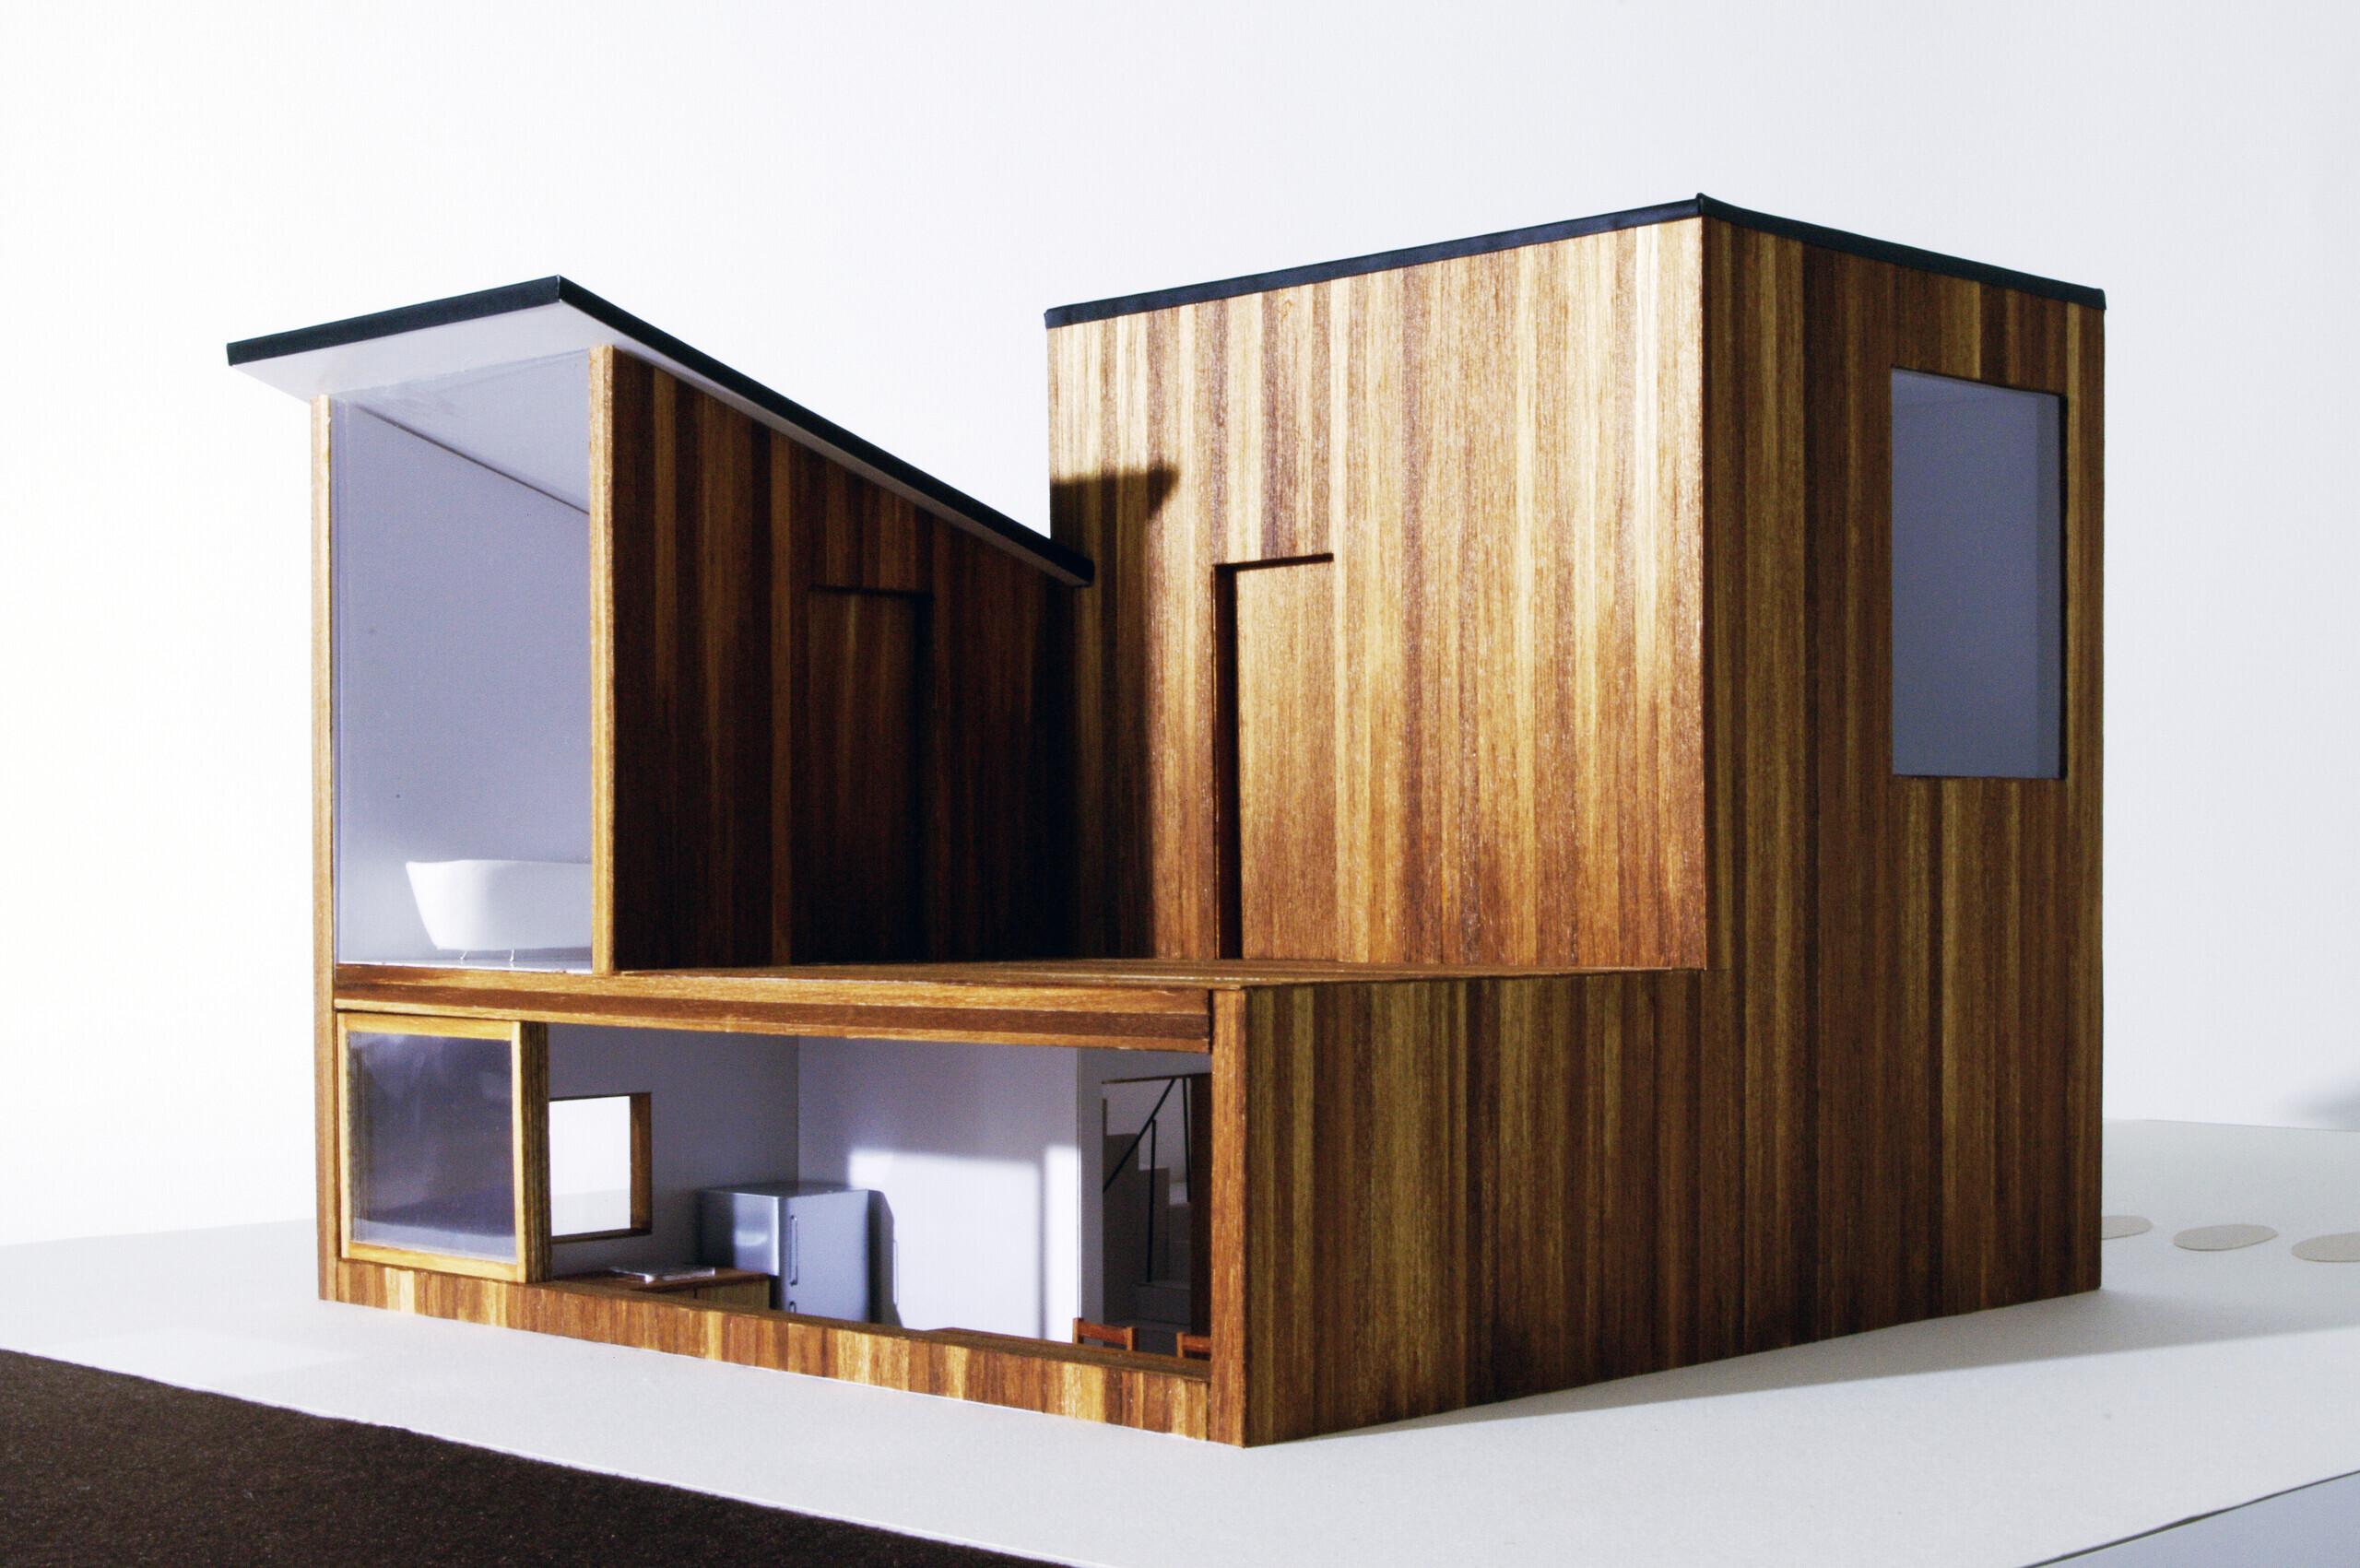 House-Mの建築事例写真